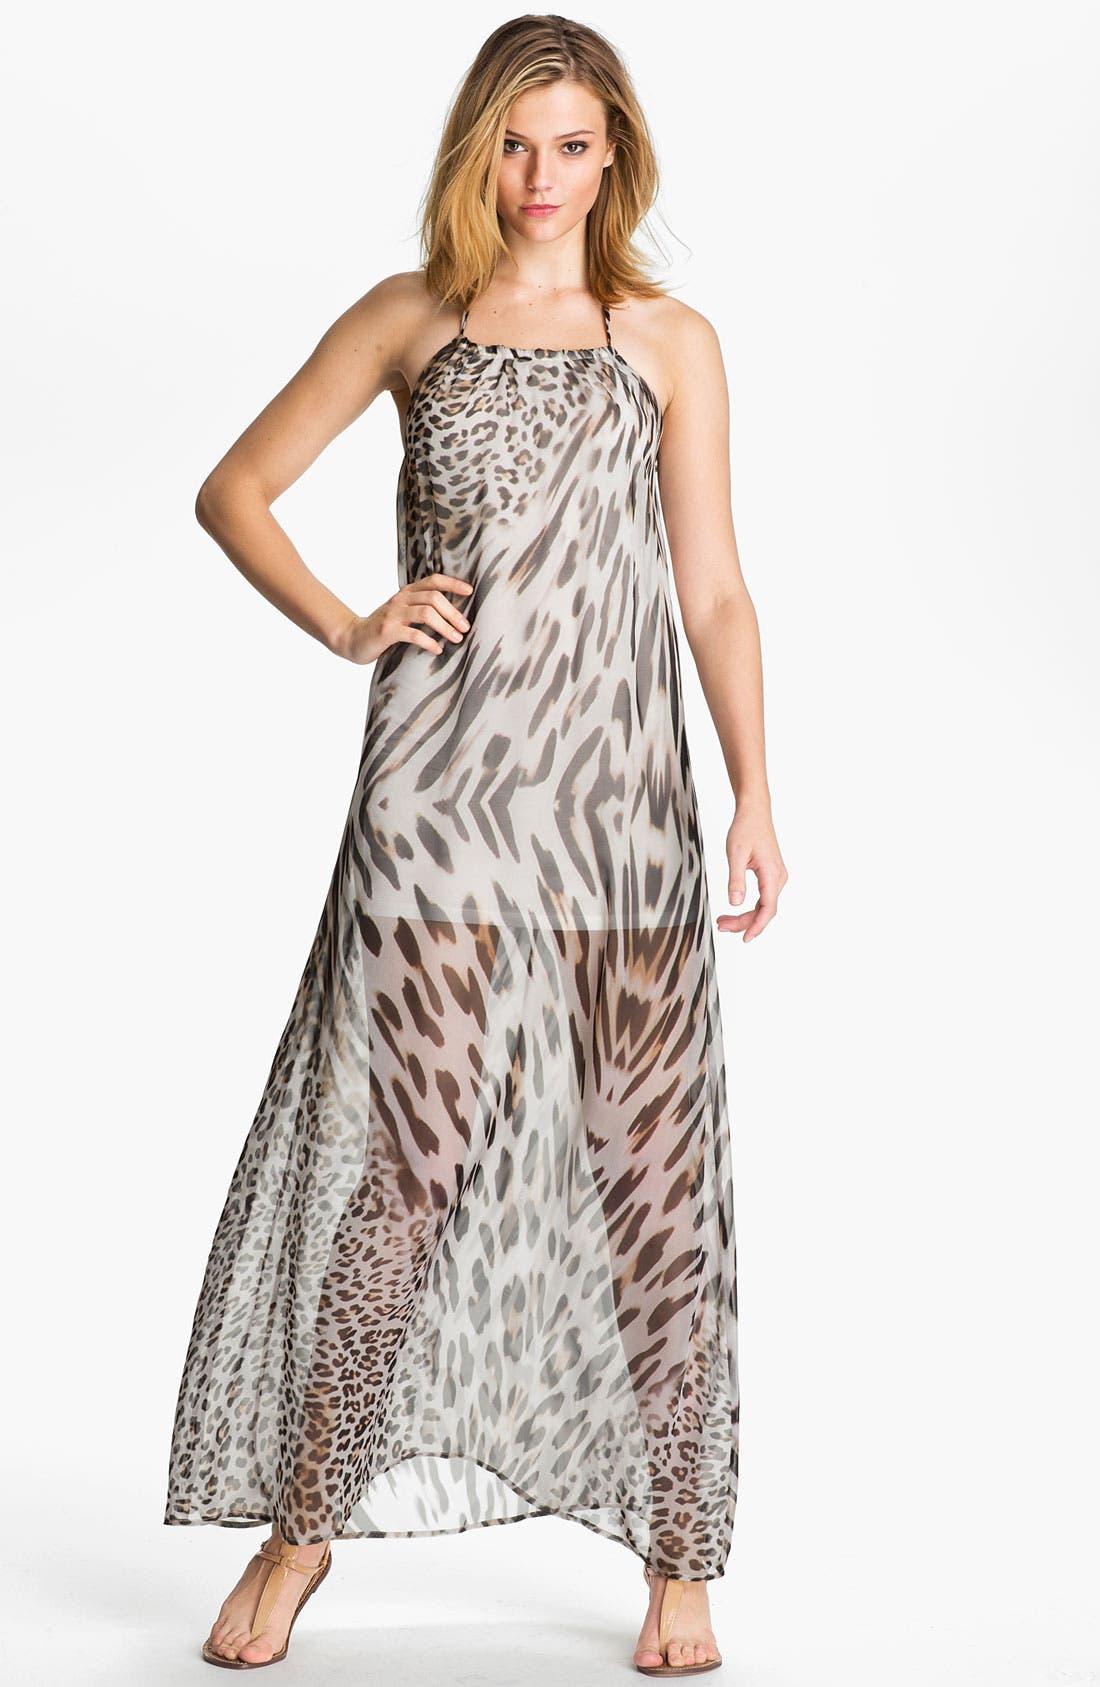 Alternate Image 1 Selected - Young, Fabulous & Broke 'Gila' Leopard Chiffon Maxi Dress